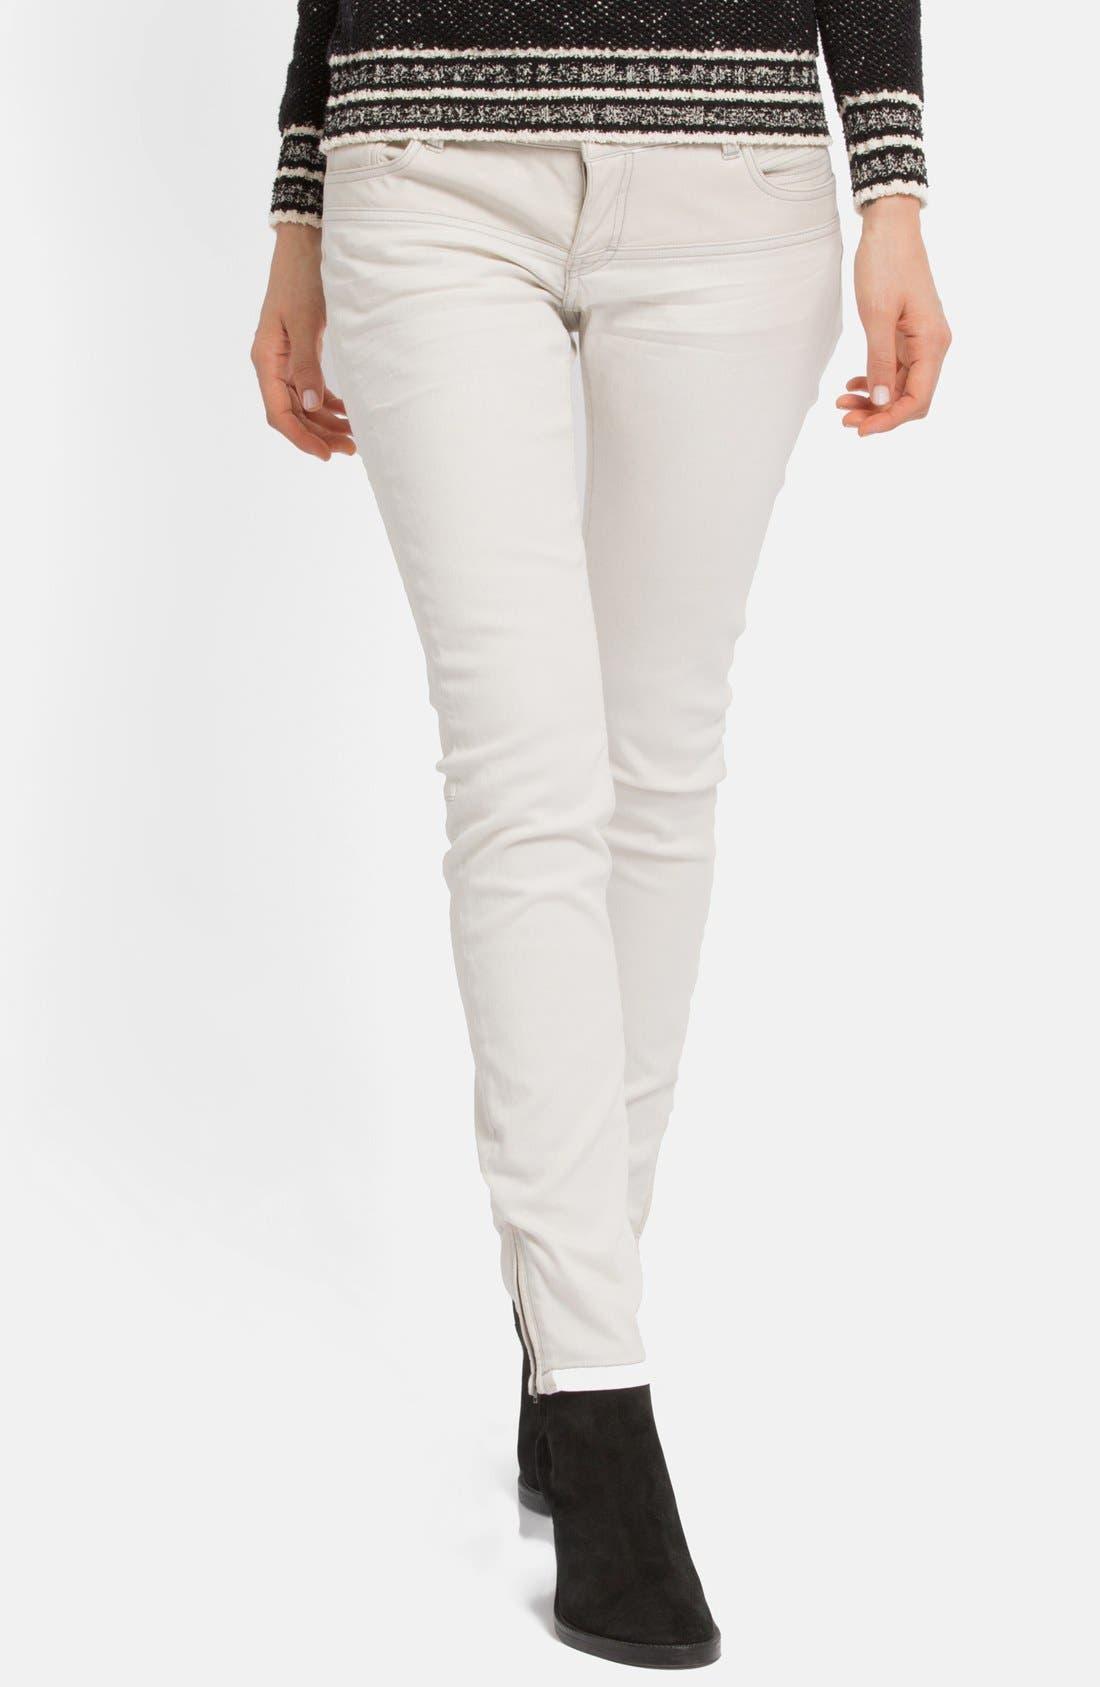 Alternate Image 1 Selected - maje Leather Panel Stretch Skinny Jeans (Ecru)